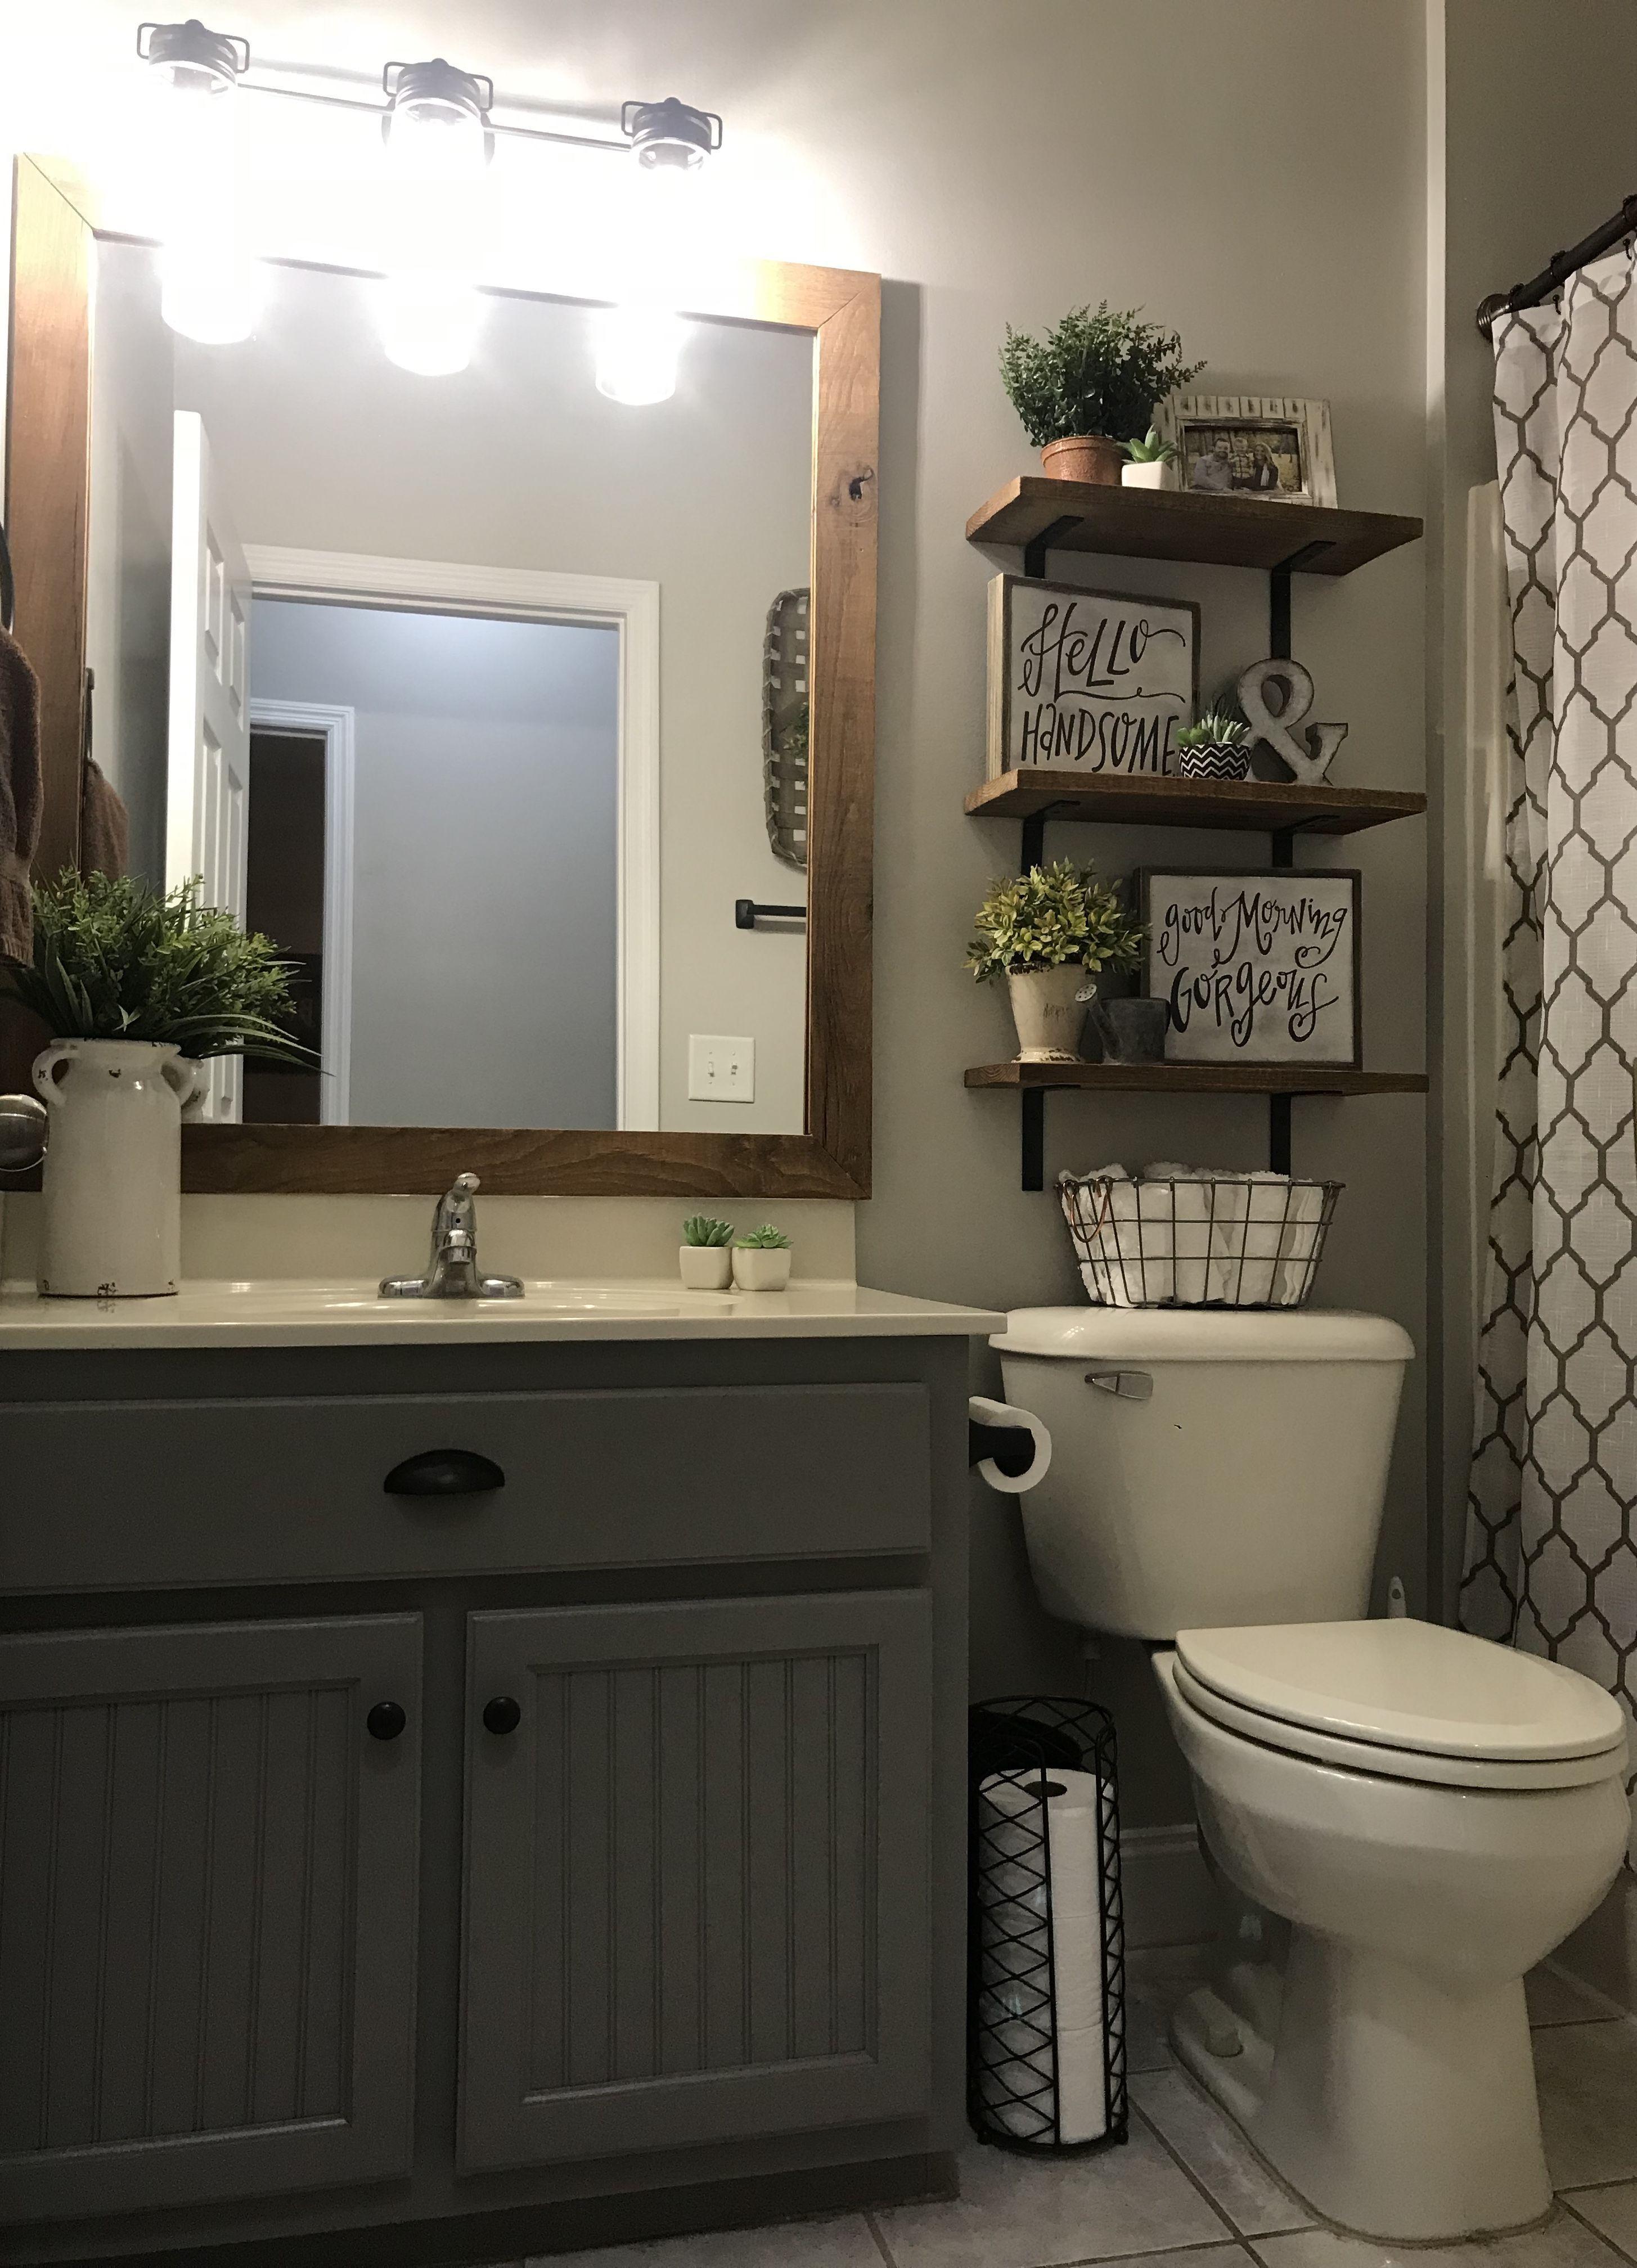 80 Clever Design Ideas For Small Bathrooms Small Bathroom Decor Guest Bathrooms Farmhouse Bathroom Decor